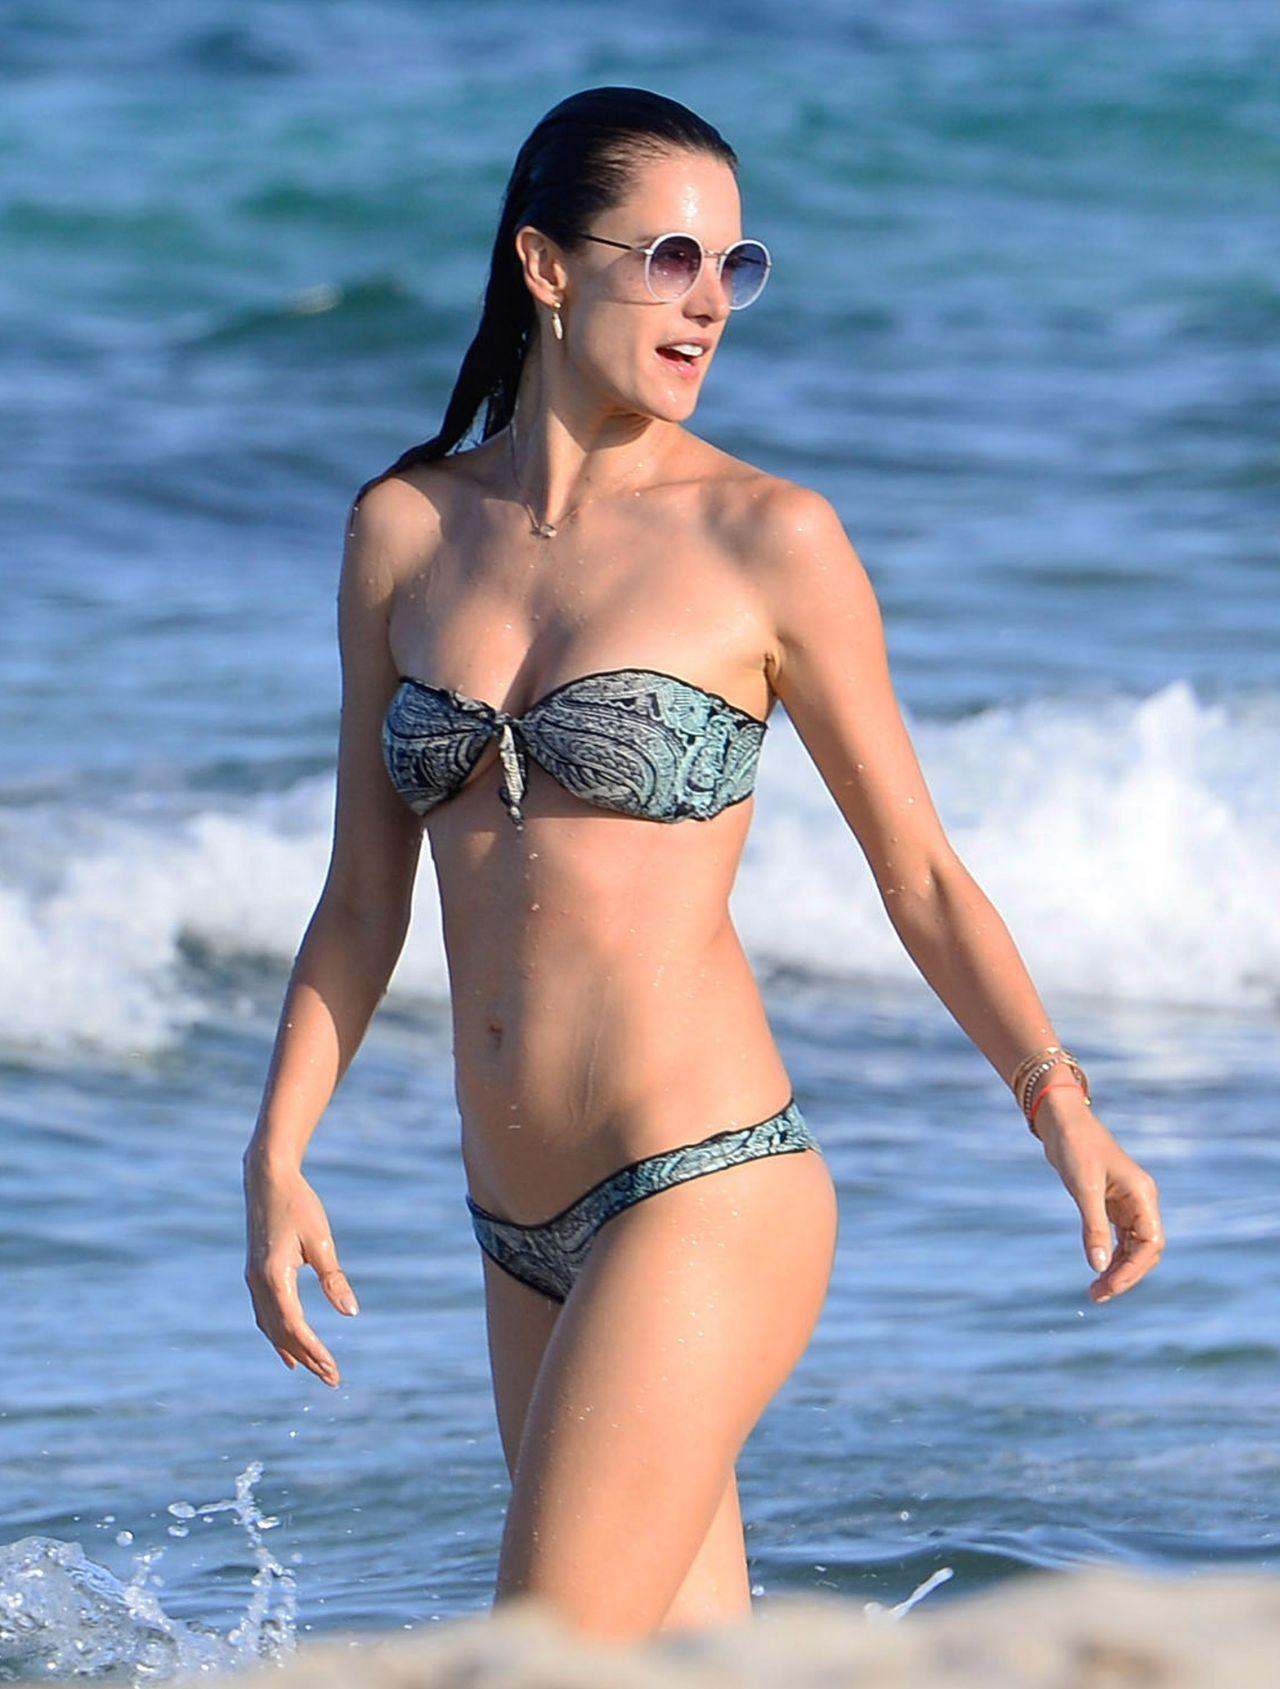 Alessandra Ambrosio Bikini Bodies Pic 28 of 35